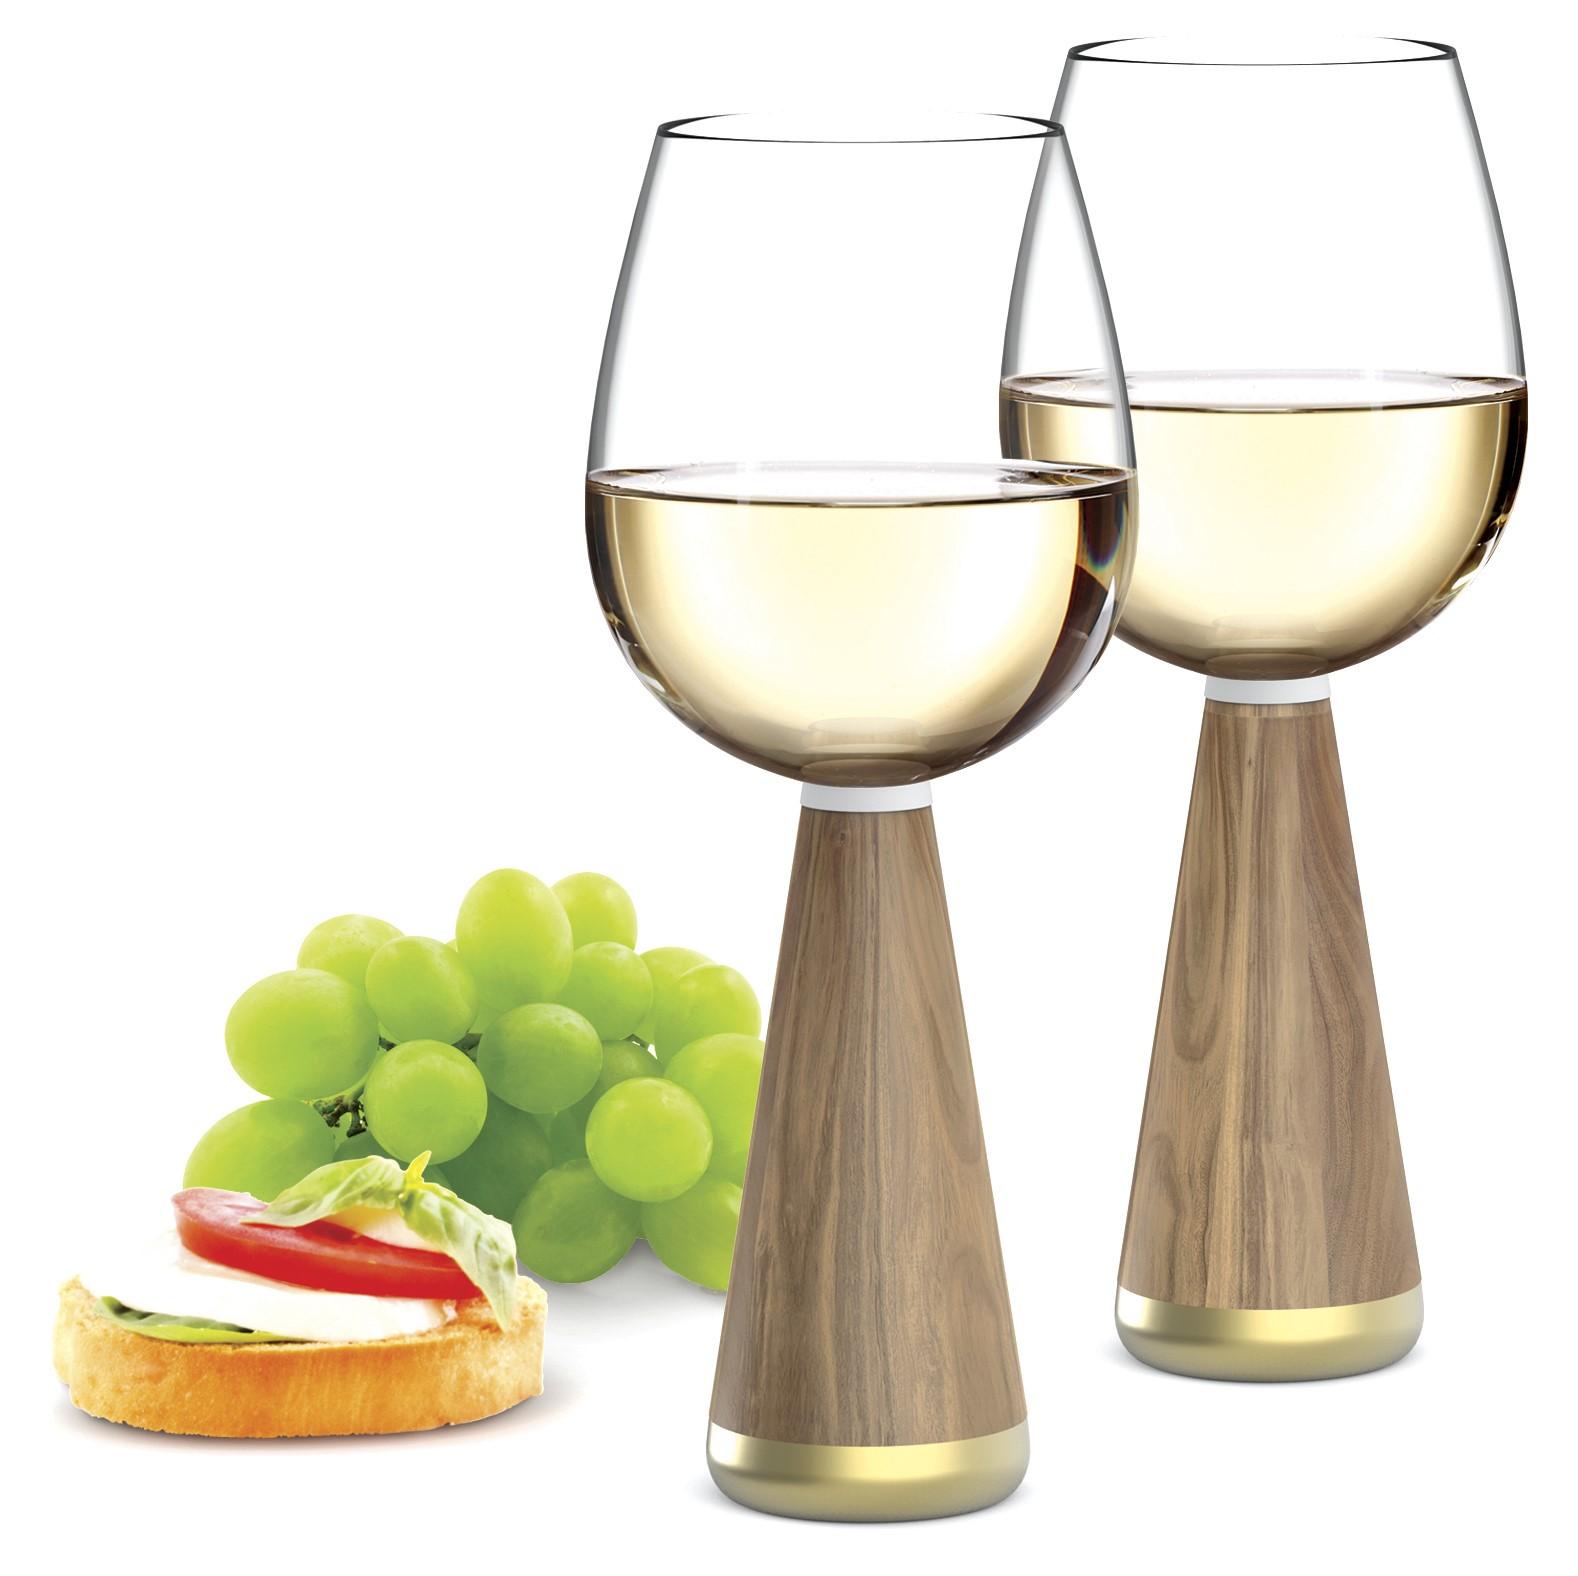 AC-2290 Afrique Wine Glasses on own - web